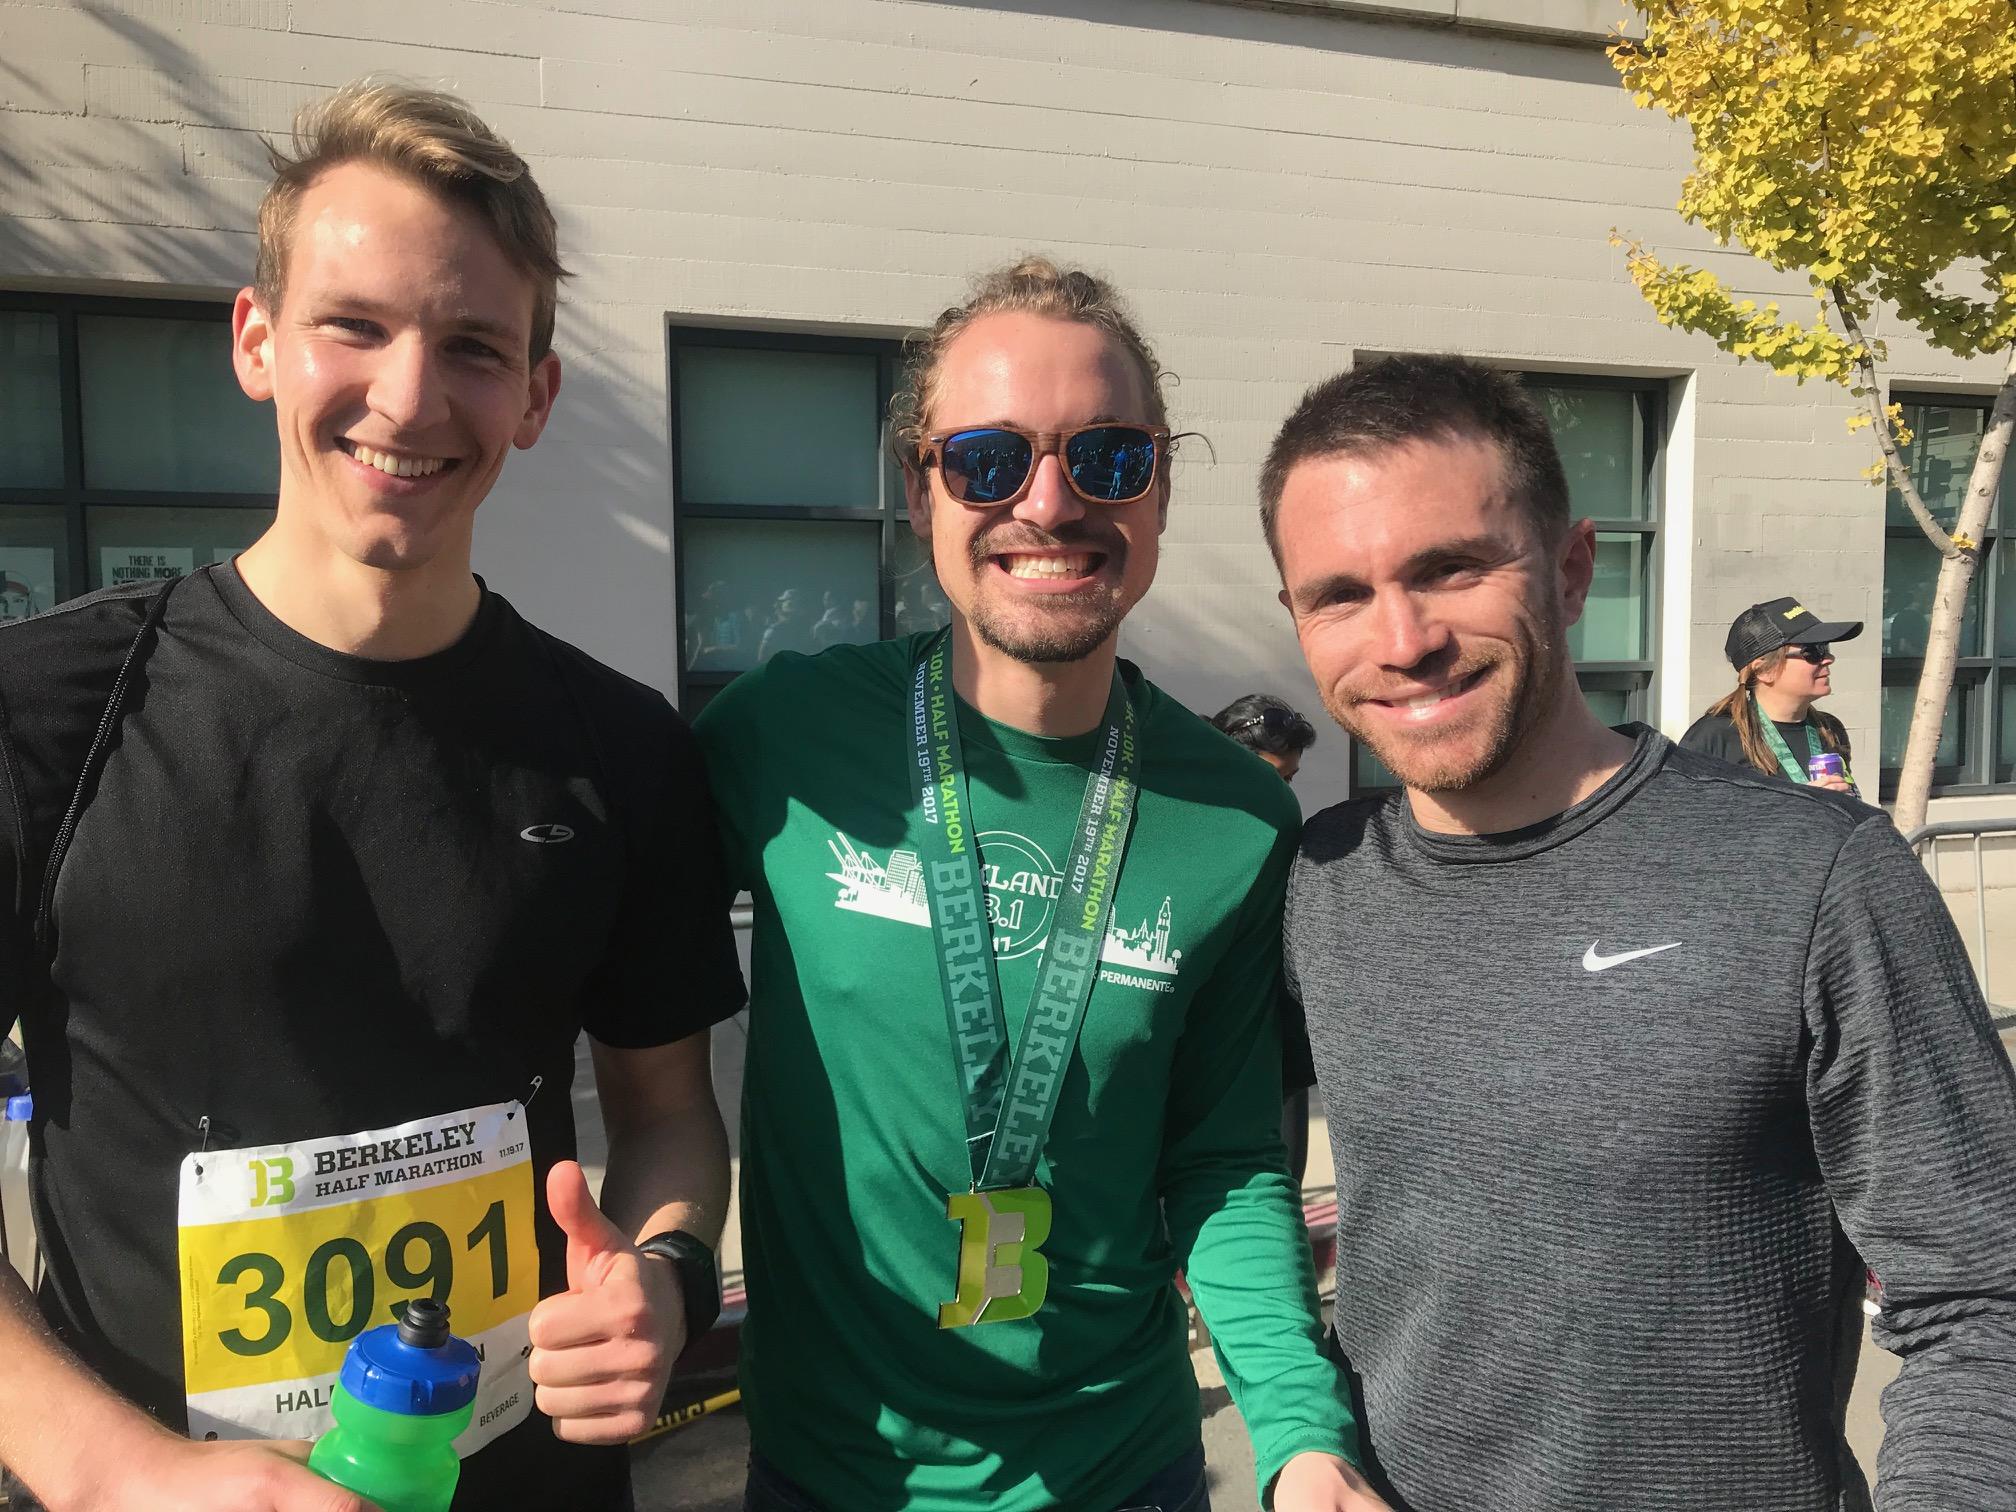 R TO L: sean, GAry (LAB), AND KYLE (LAB). KYLE has organized the BFC RUNS Berkeley Half Marathon fundraiser for several years